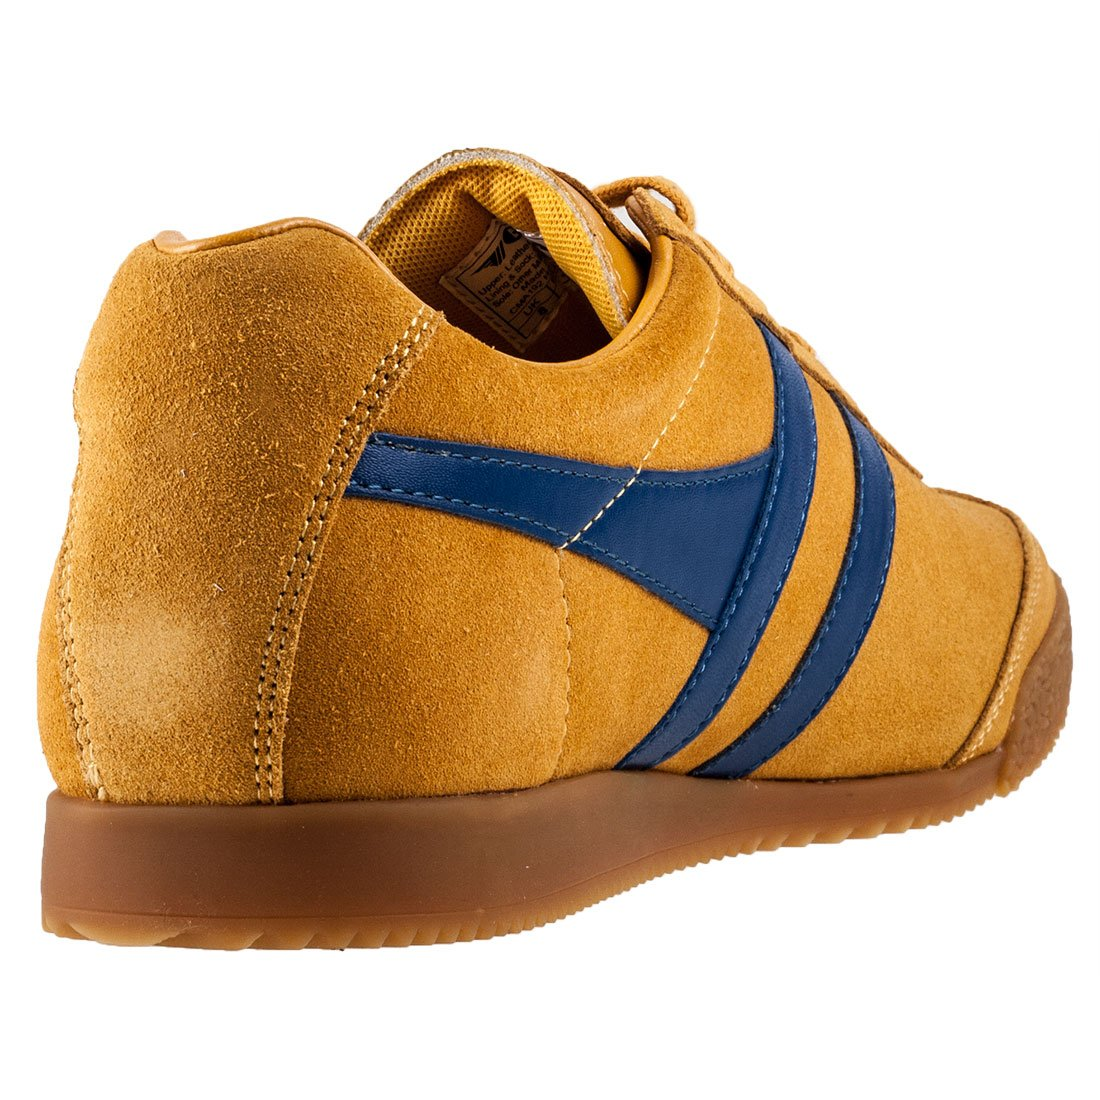 Dkfjki Men 's Leather Men's Shoes Busine PTkOwXZiu